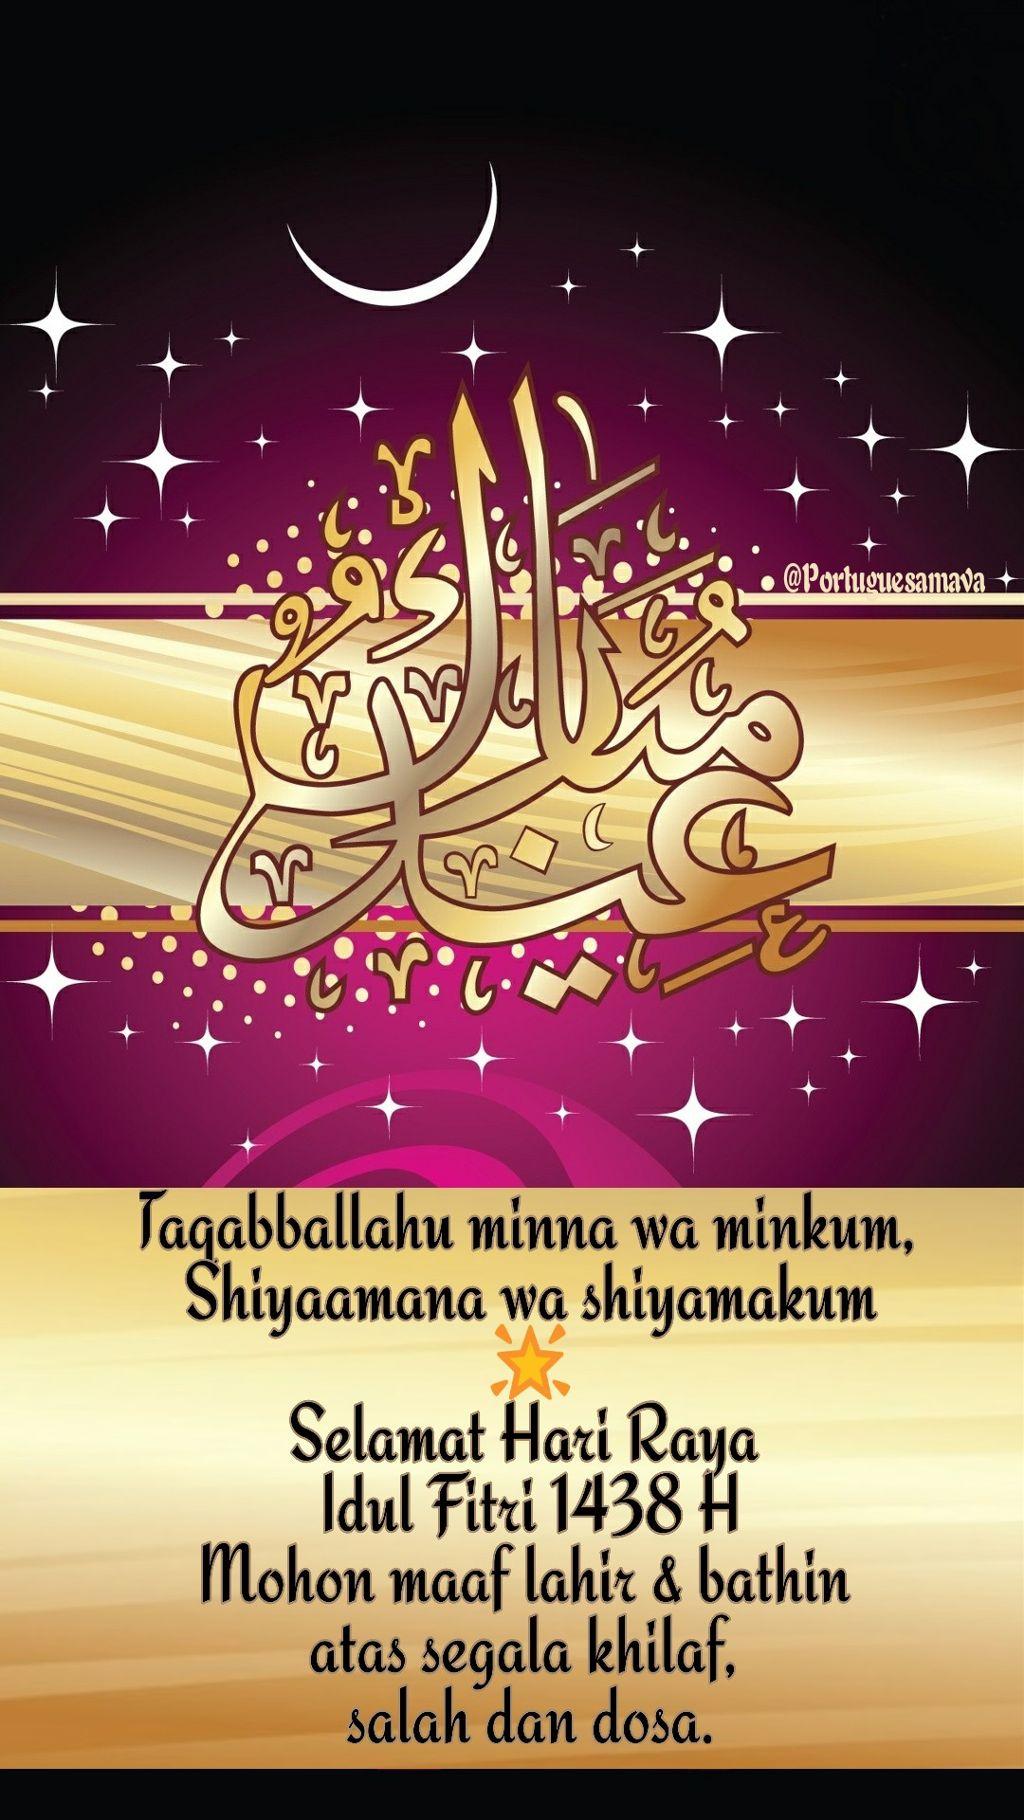 Eid Mubarak Greetings Idulfitri Lebaran2017 Eidmubarak2